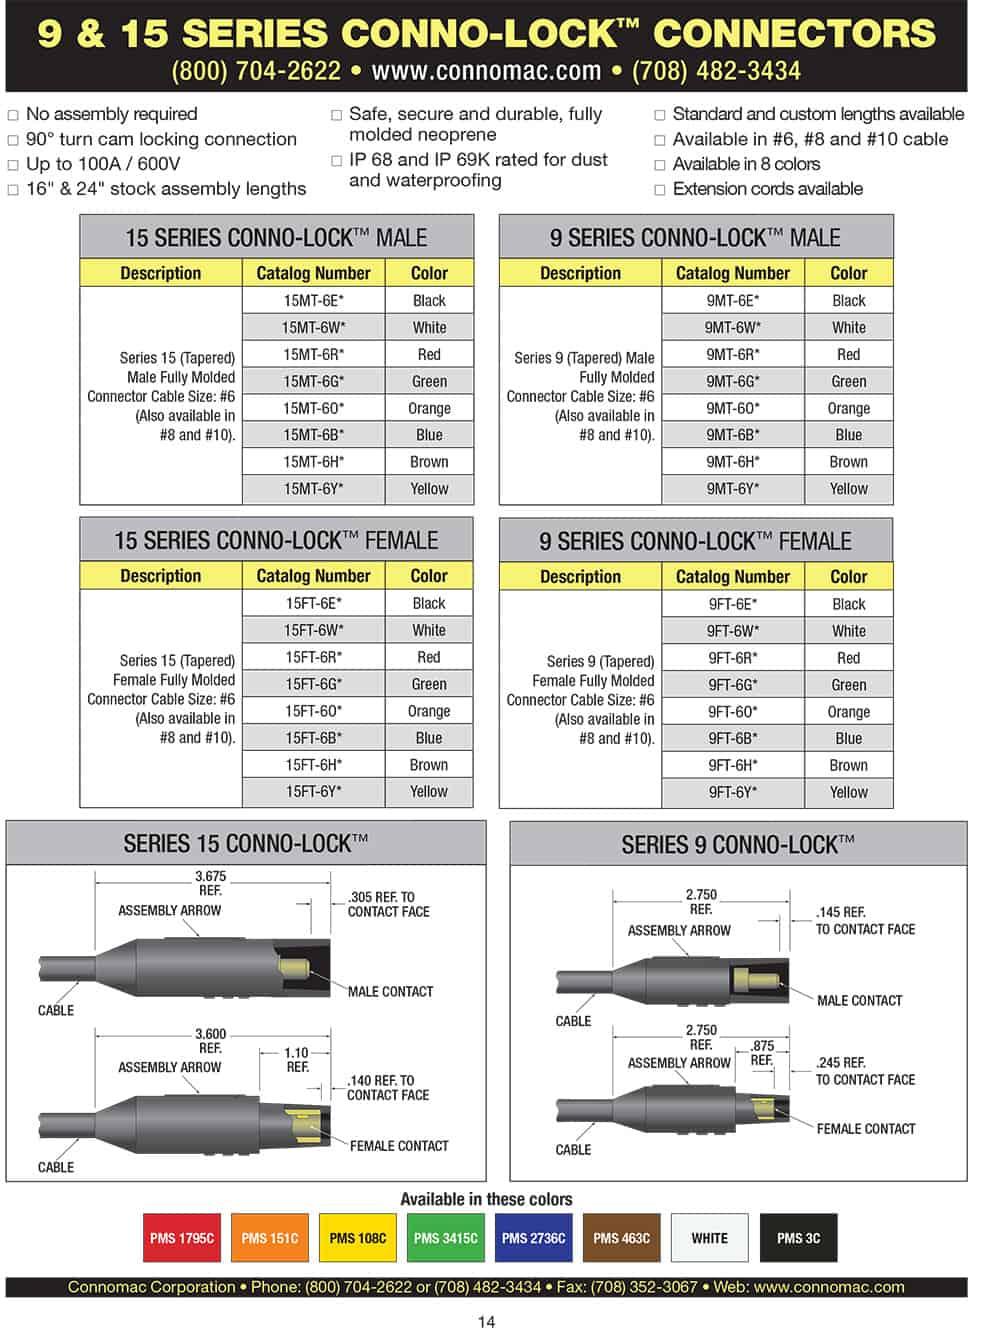 Conno Lock 9 & 15 series connectors spec sheet